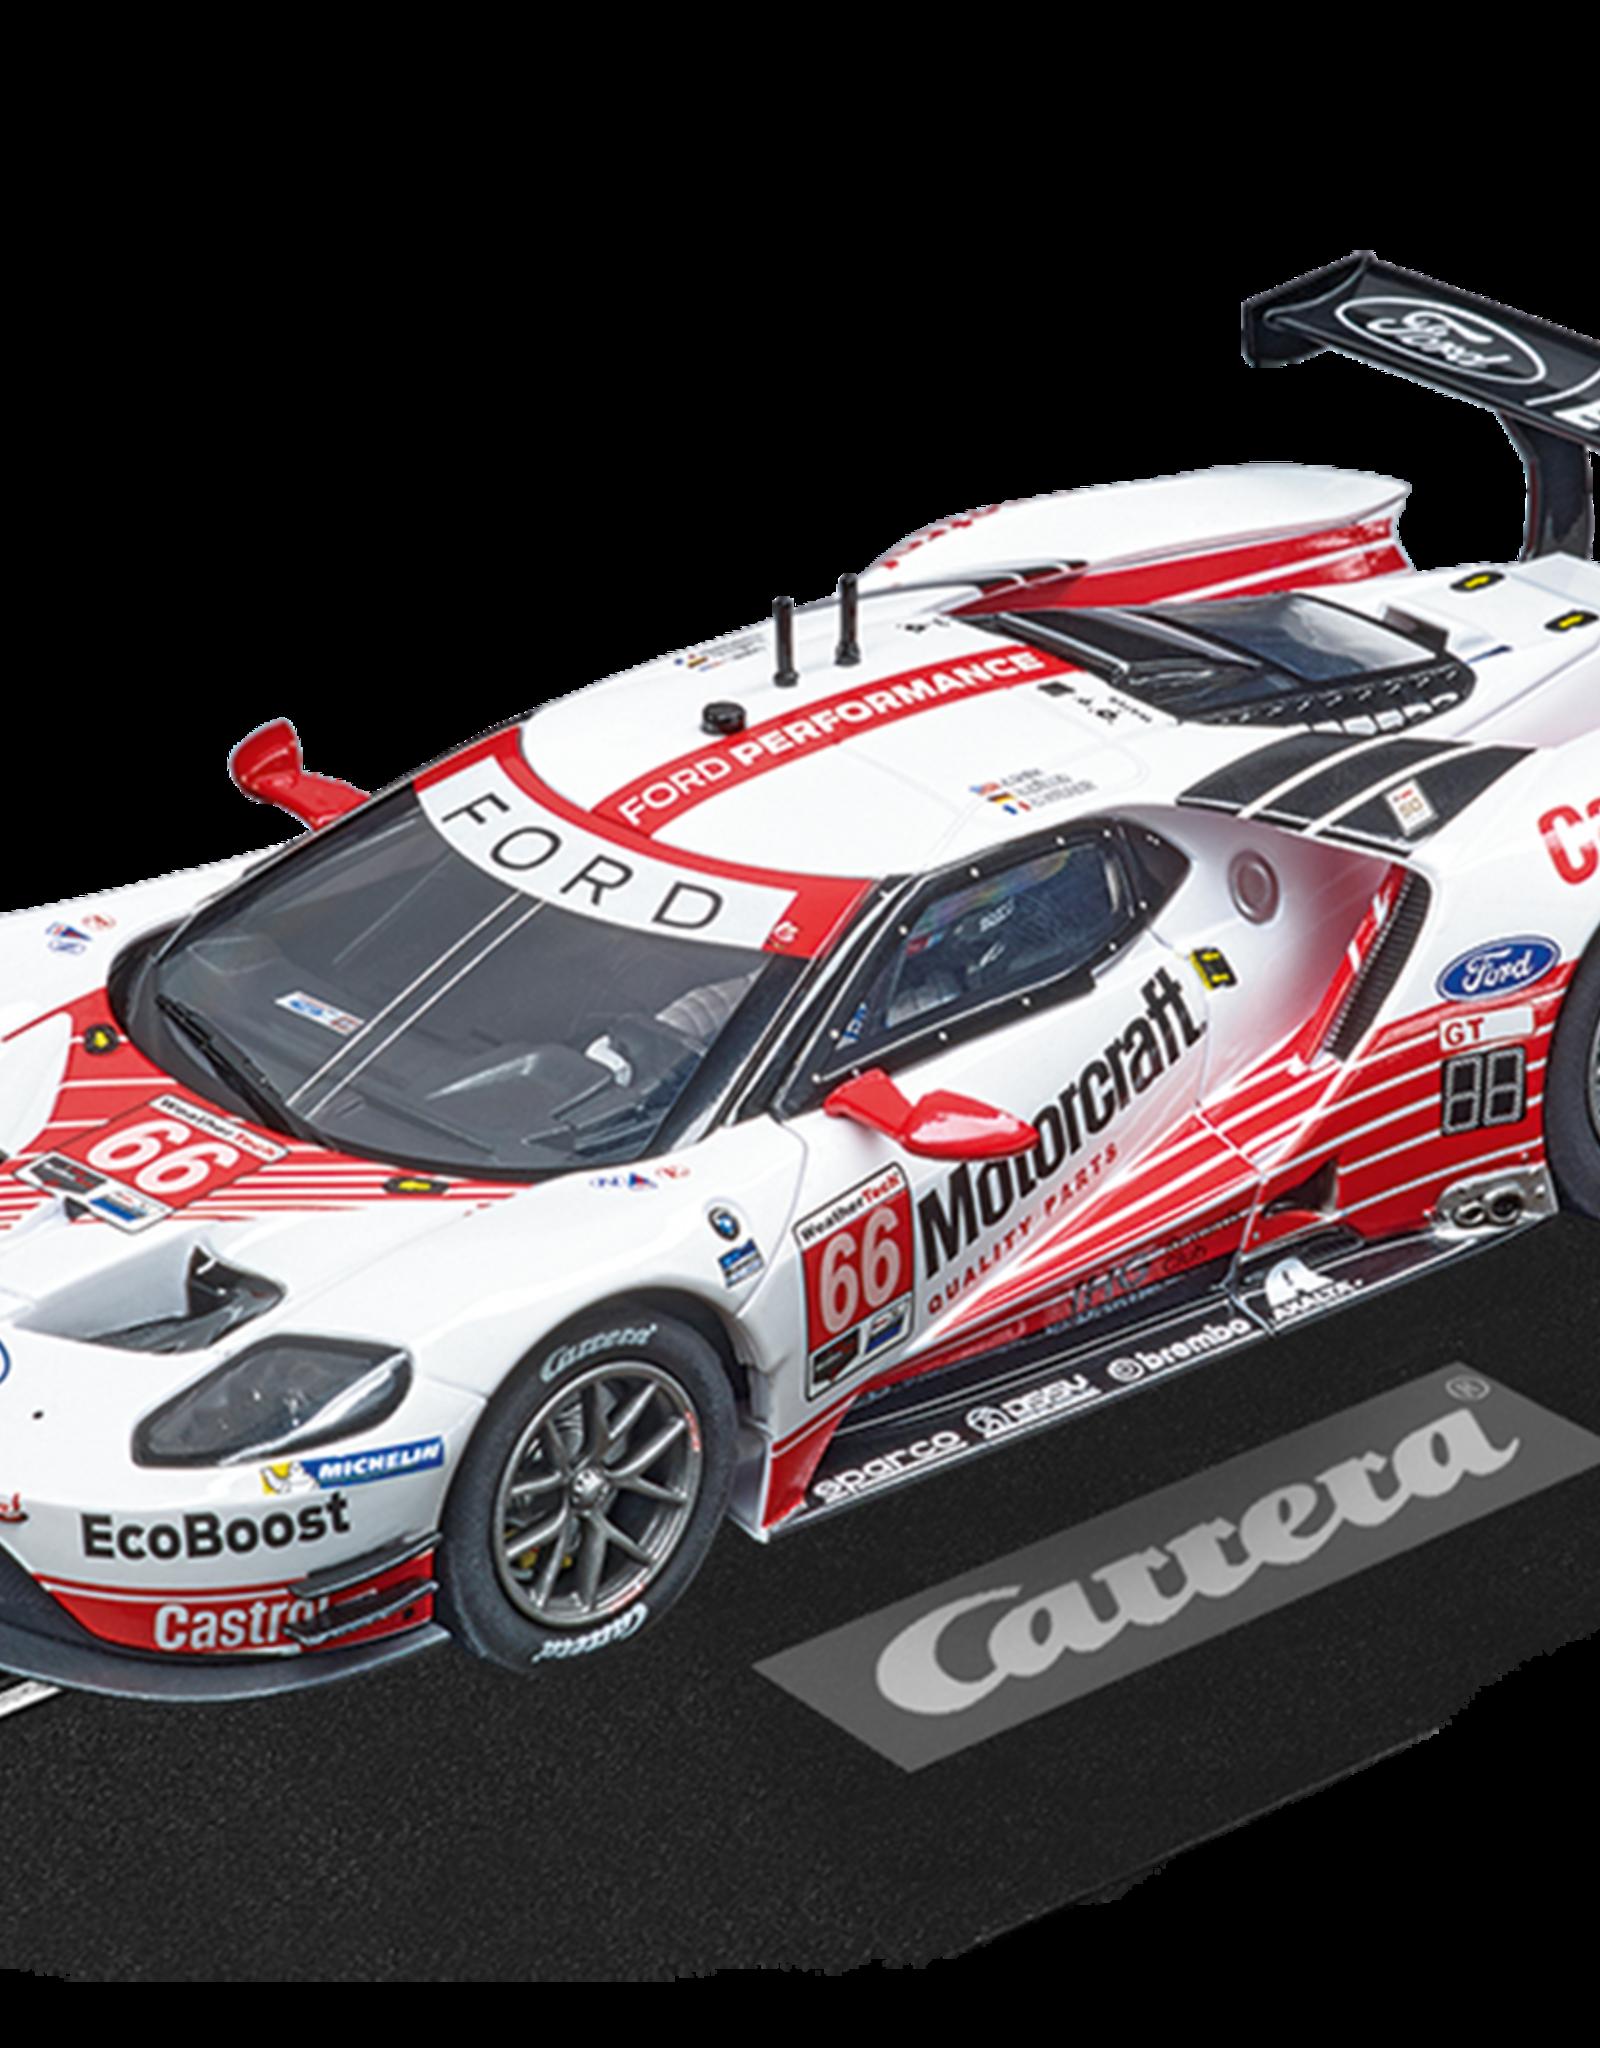 carrera CAR30913 Ford GT Race Car No.66, Digital 132 w/Lights